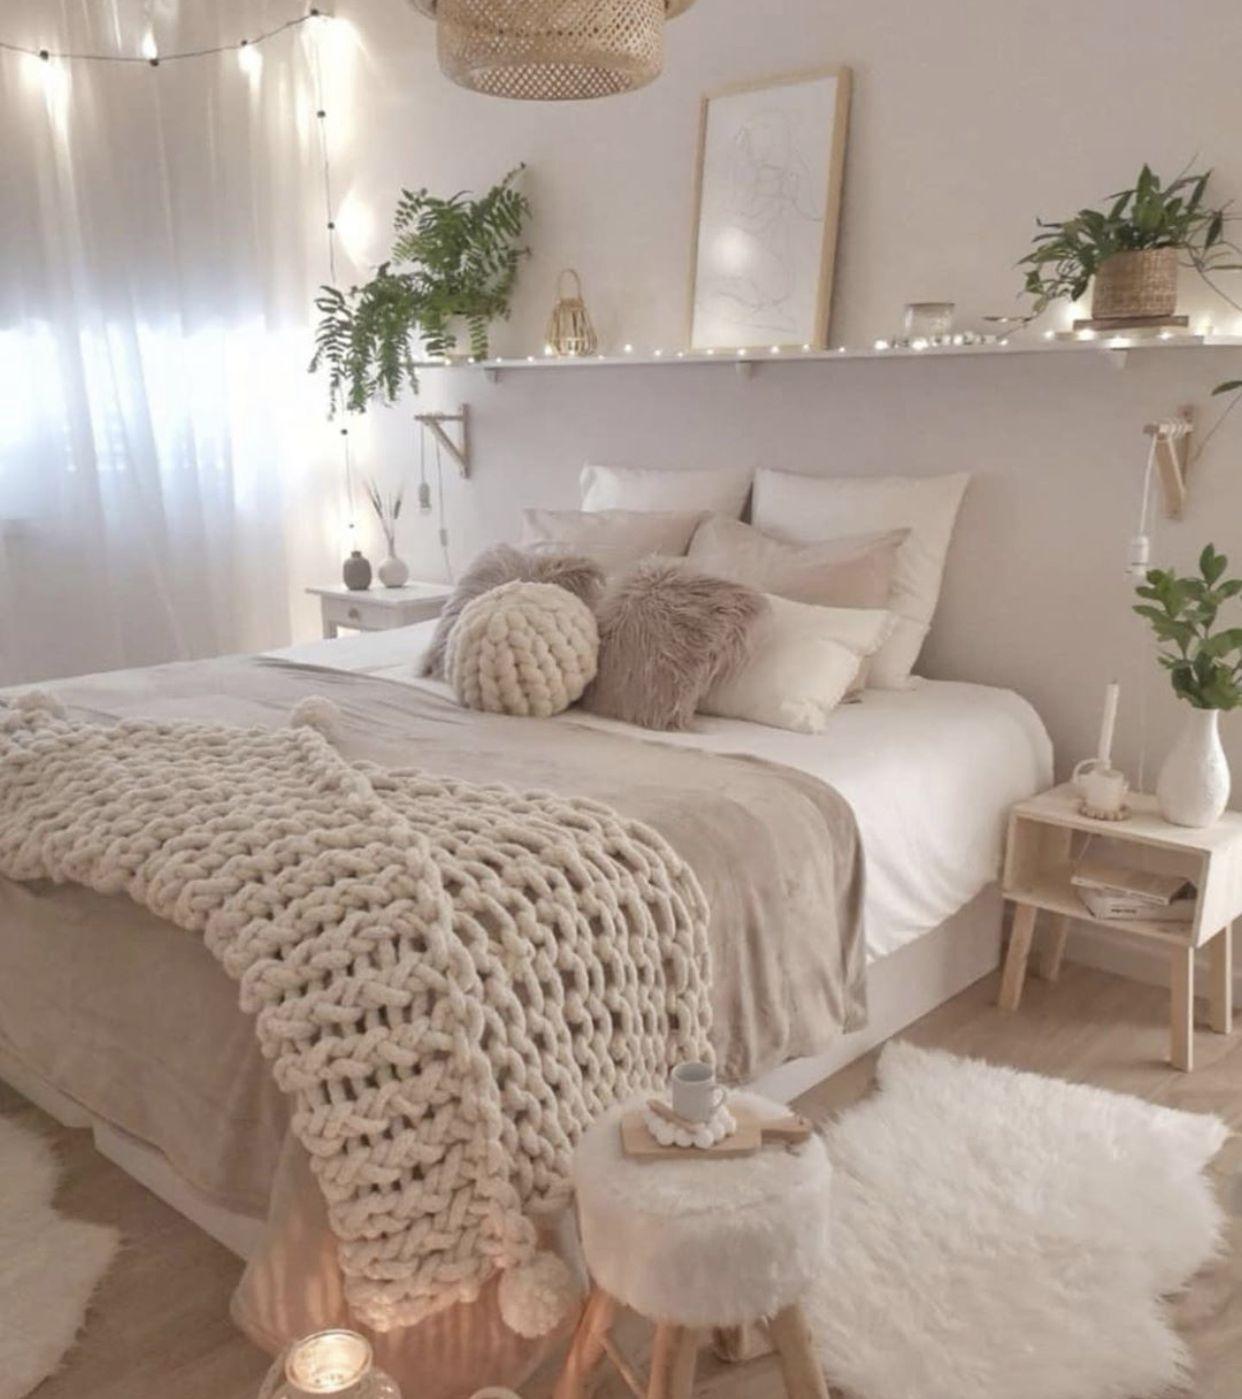 Bedroom Decor 2020 Room Inspiration Bedroom Cozy Room Decor Room Decor Bedroom Cozy bedroom ideas items